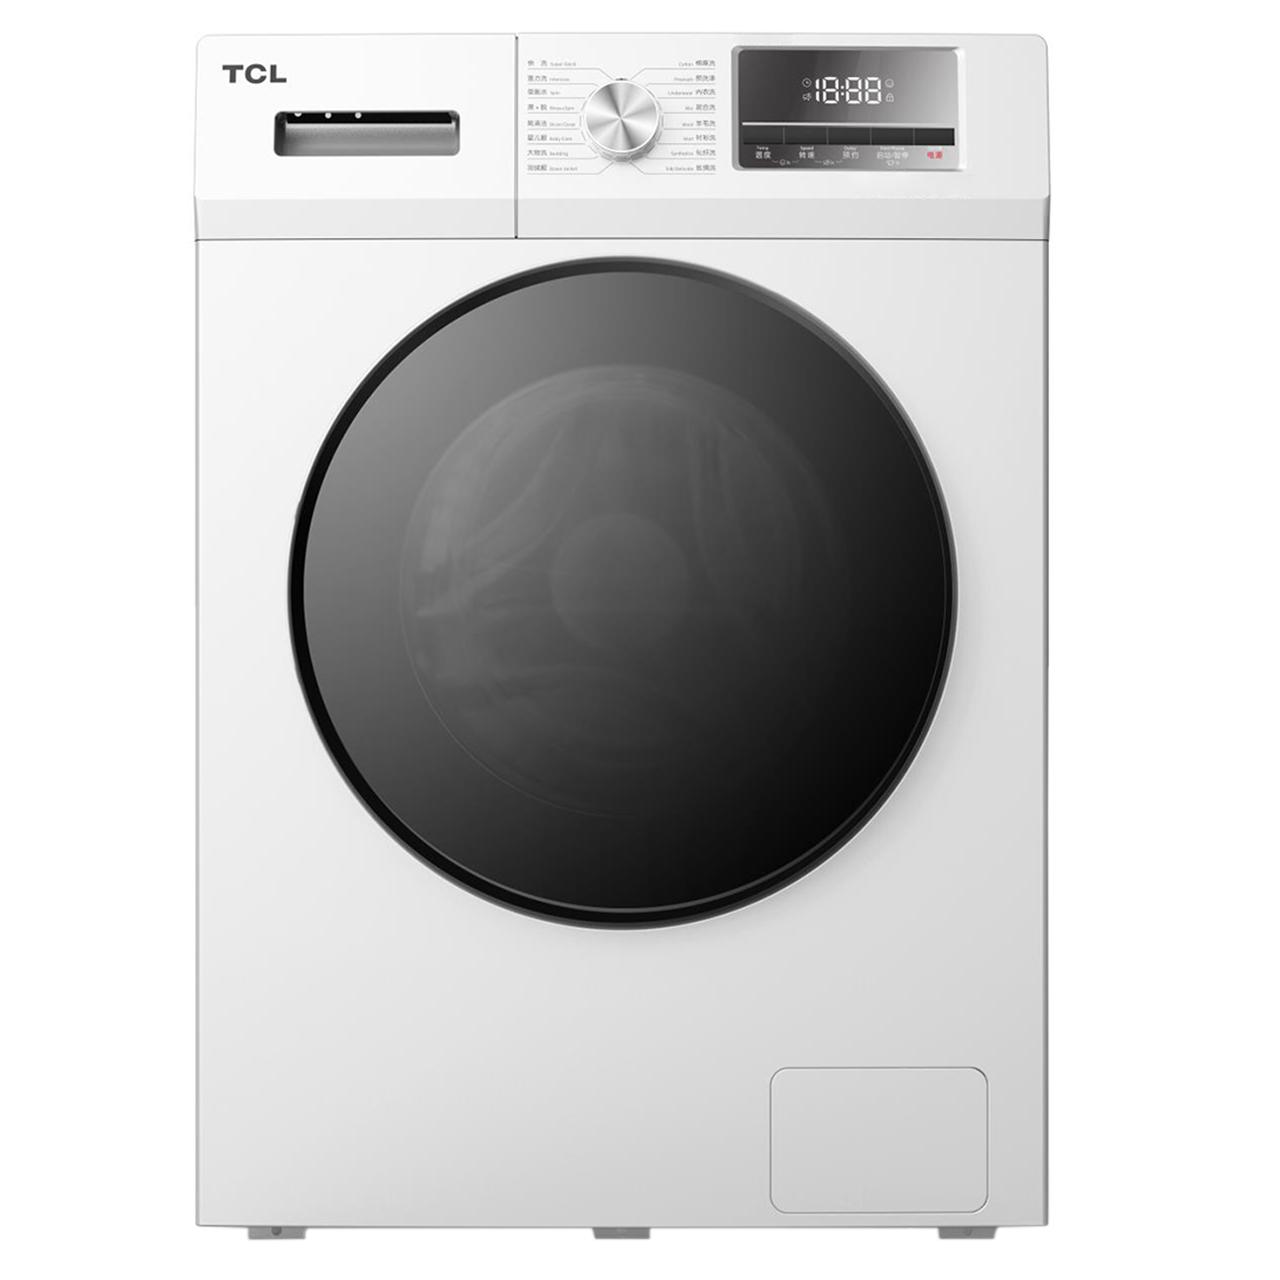 ماشین لباسشویی تی سی ال مدل TWG-852 ظرفیت 8.5 کیلوگرم